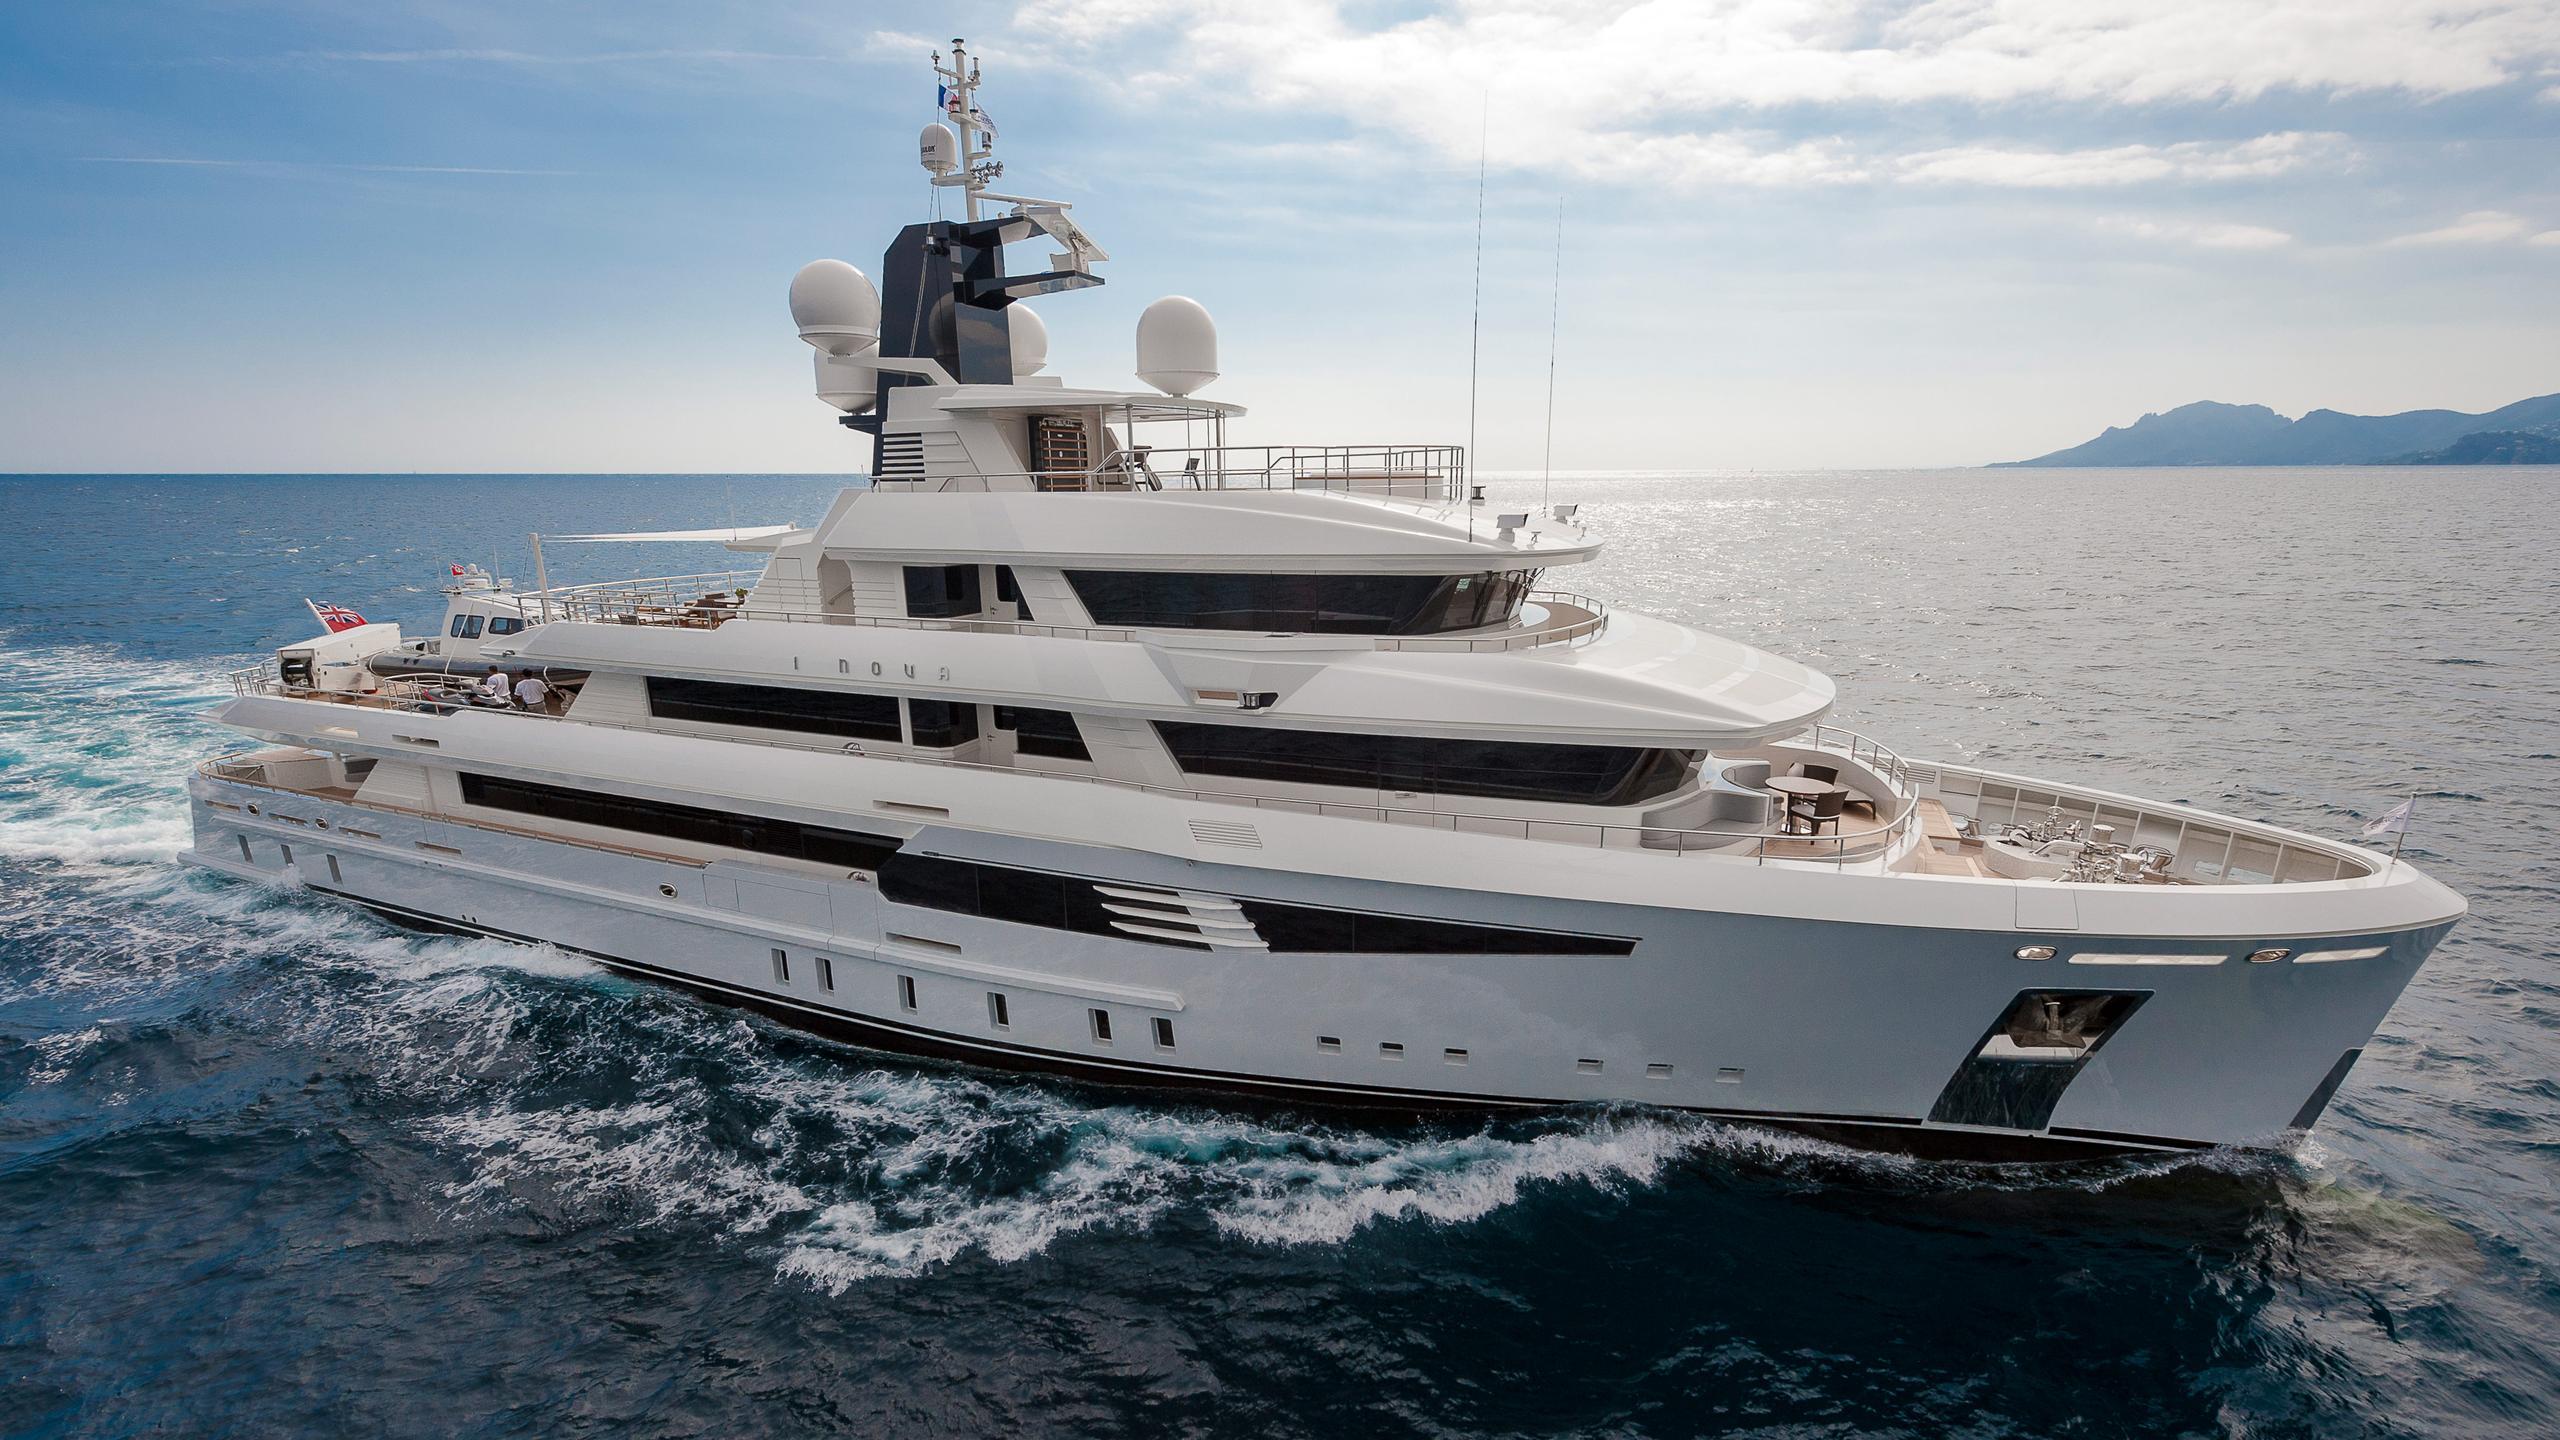 i-nova-explorer-yacht-cosmo-2013-50m-half-profile-cruising